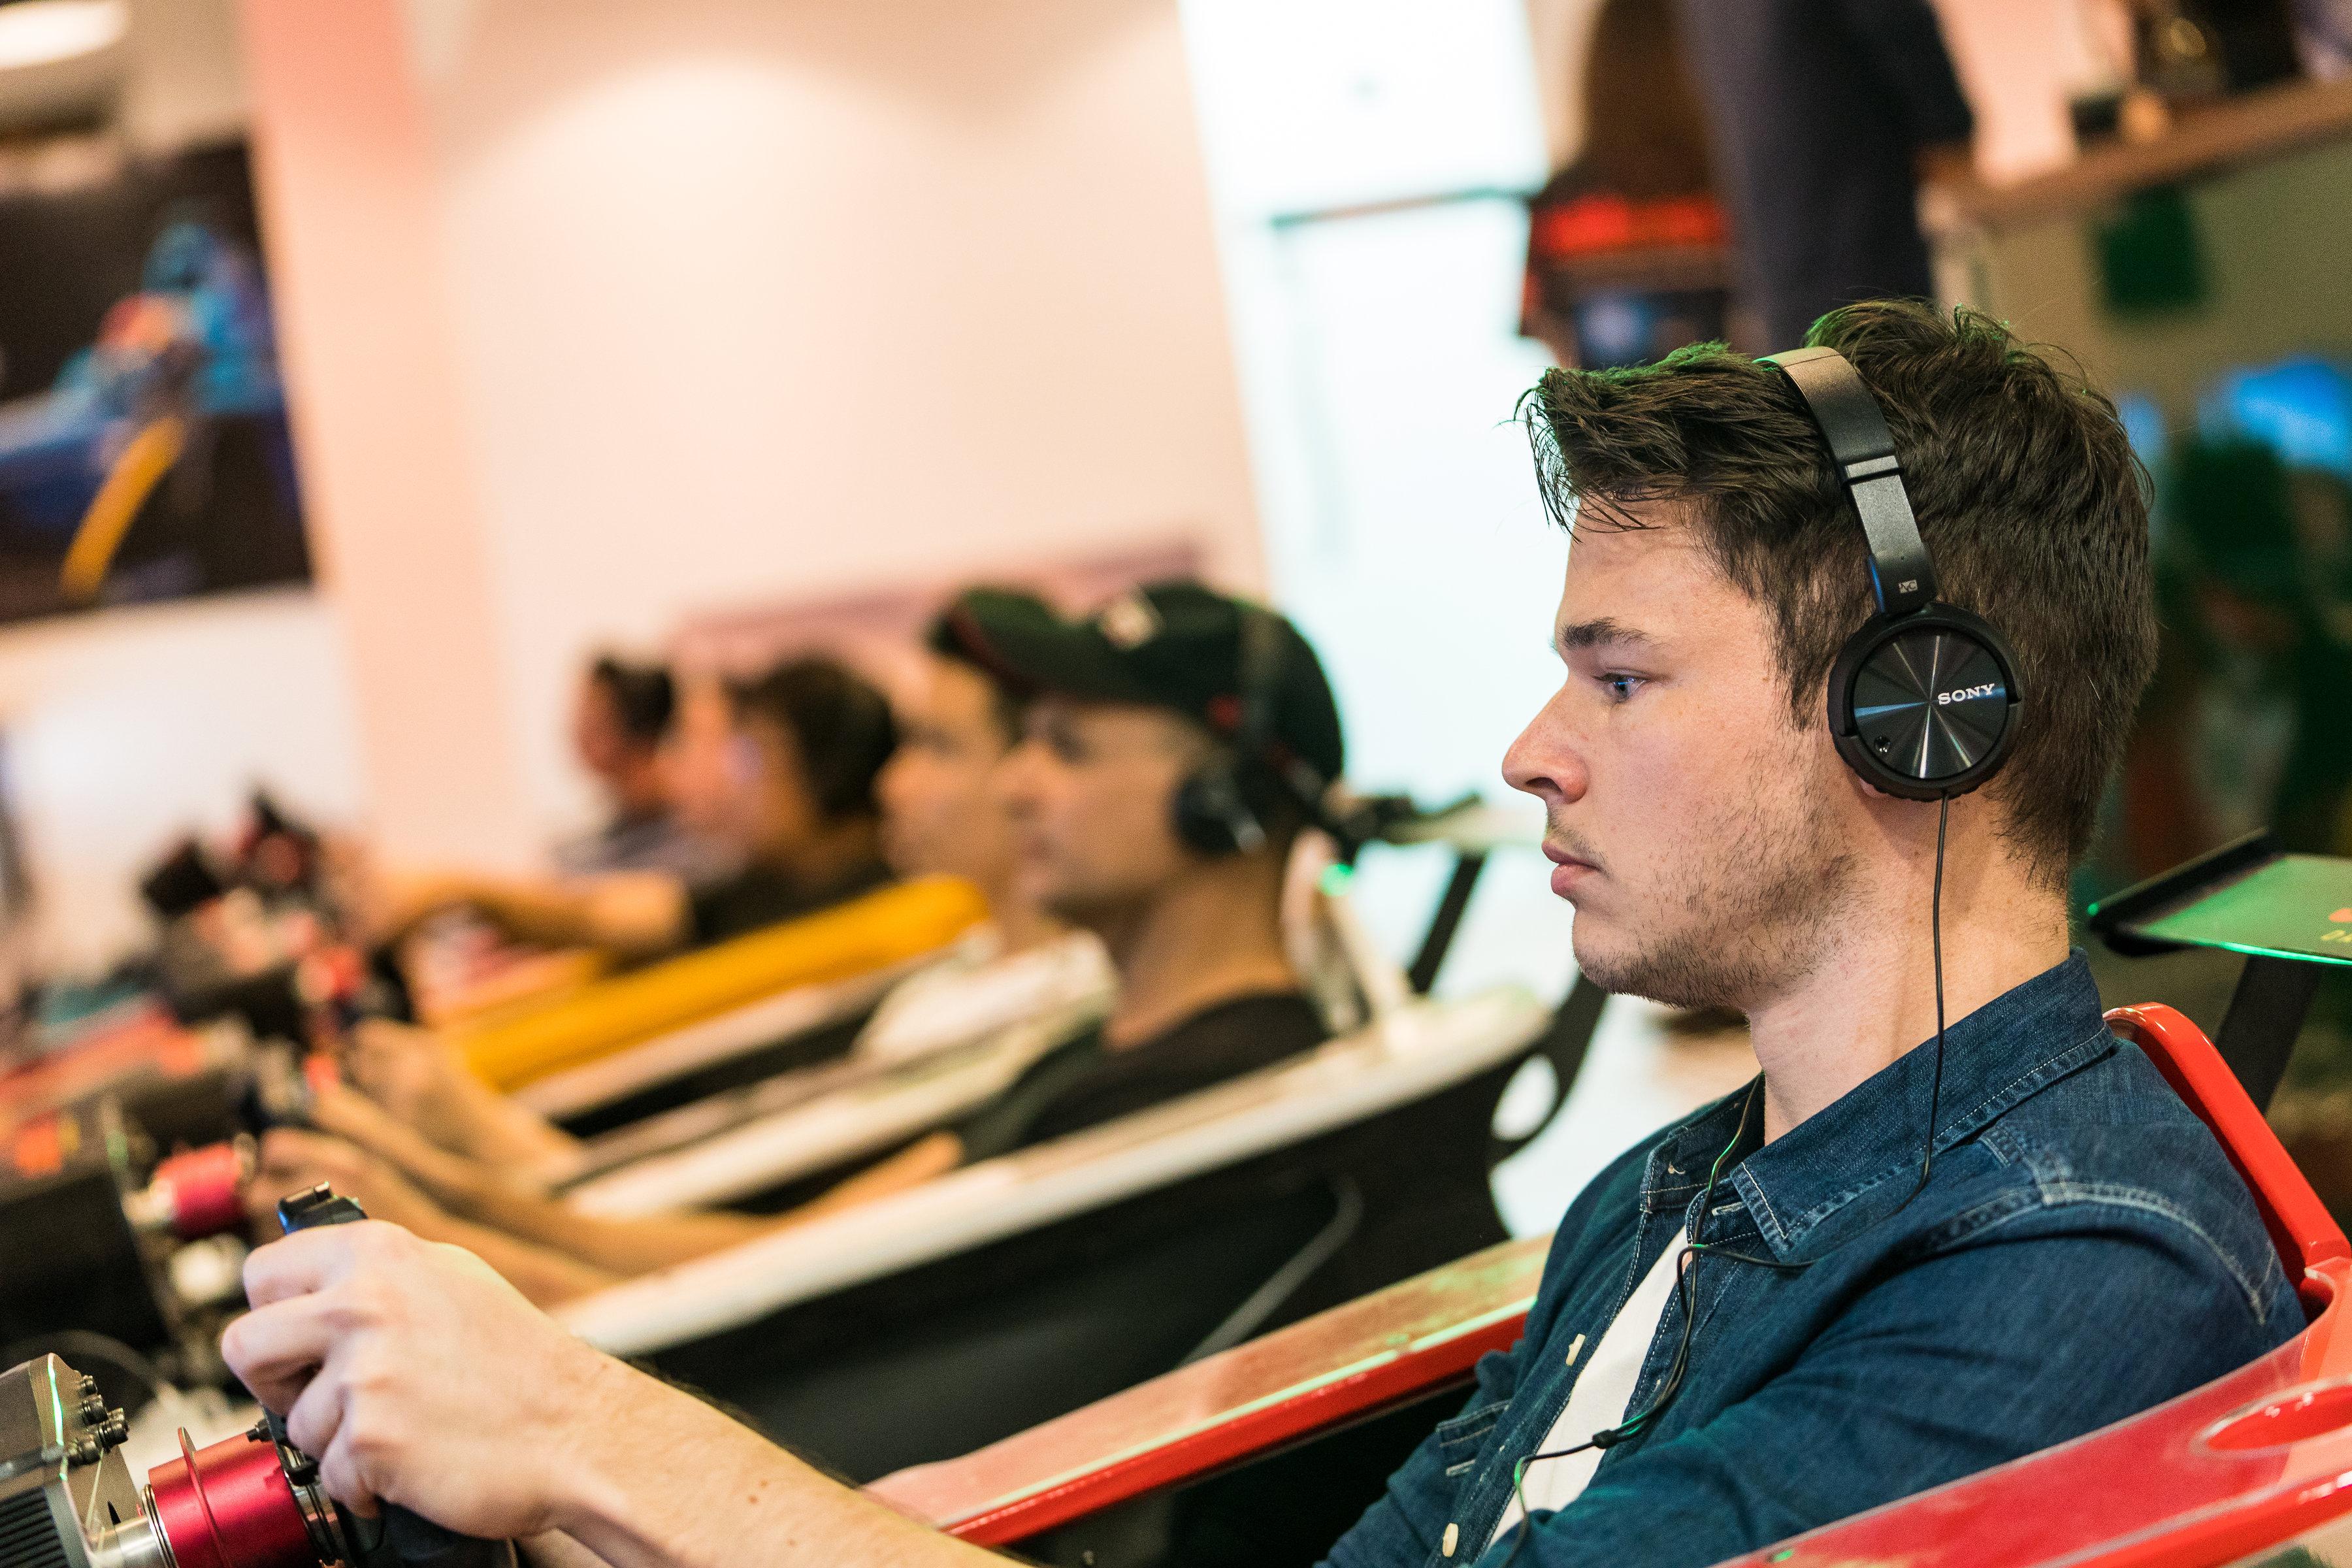 Black Arts Racing driver Dan Wells has a go on one of Sideways Driving Club's simulators.